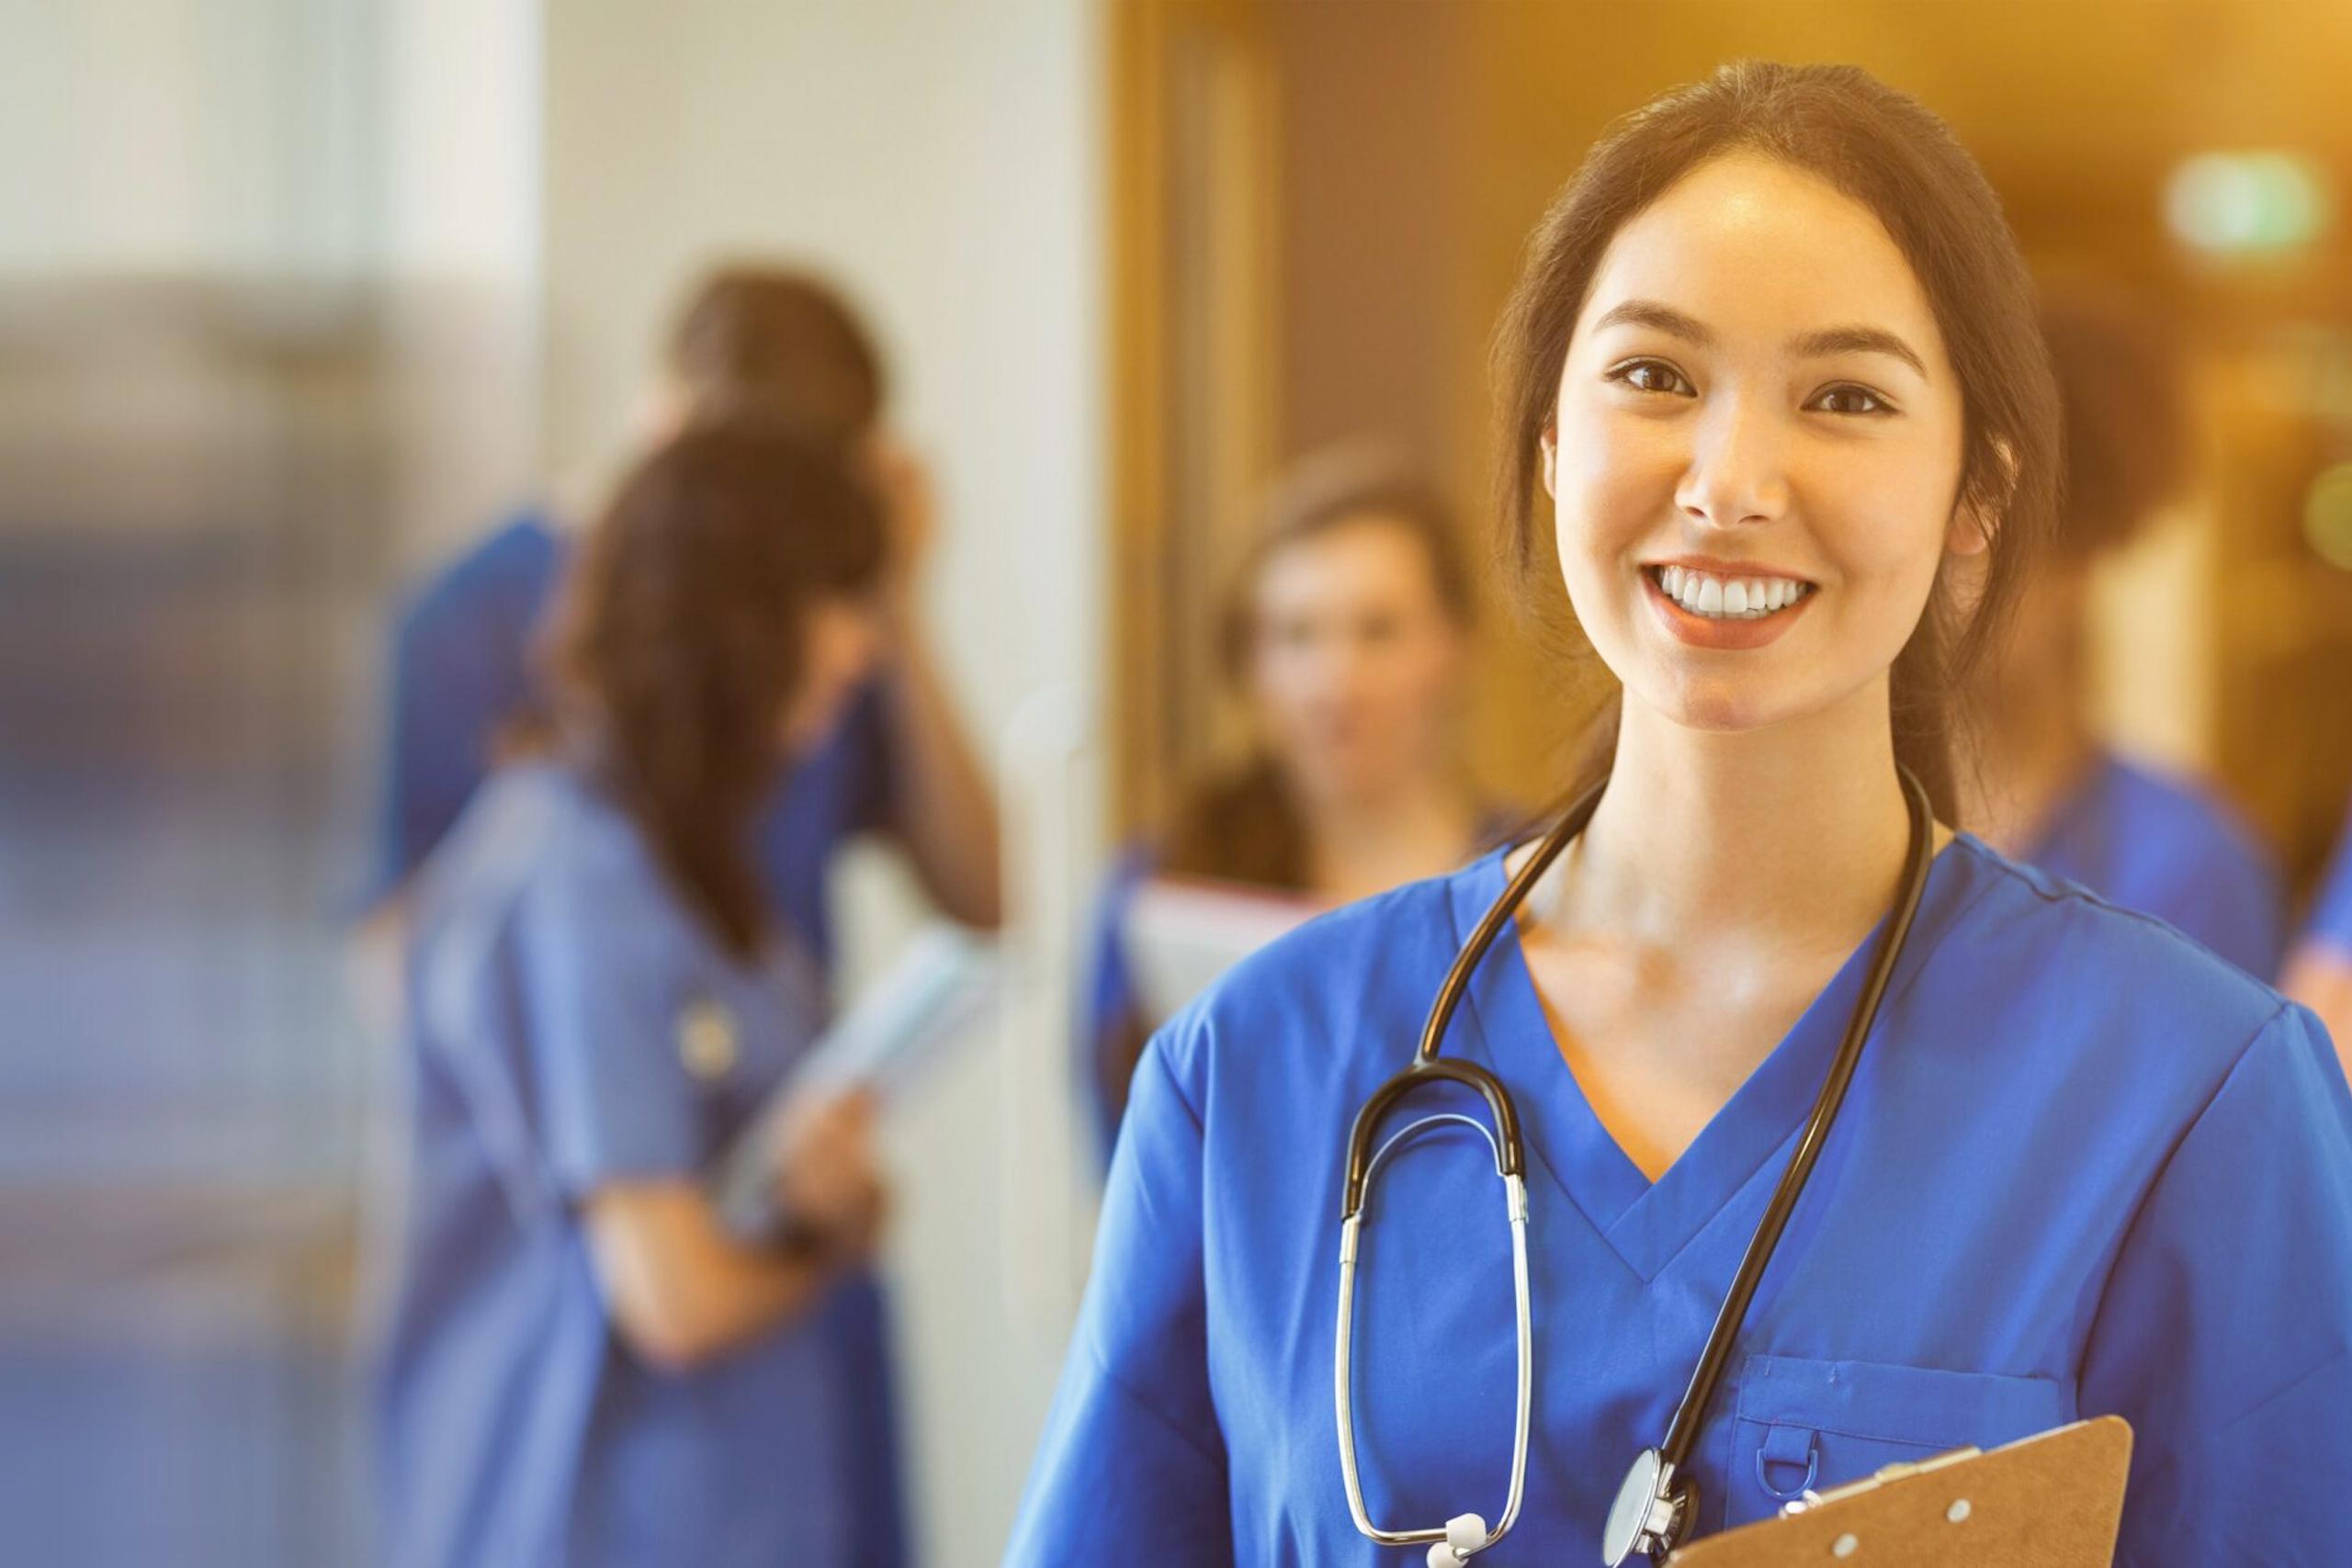 Healthcare & Hospitals